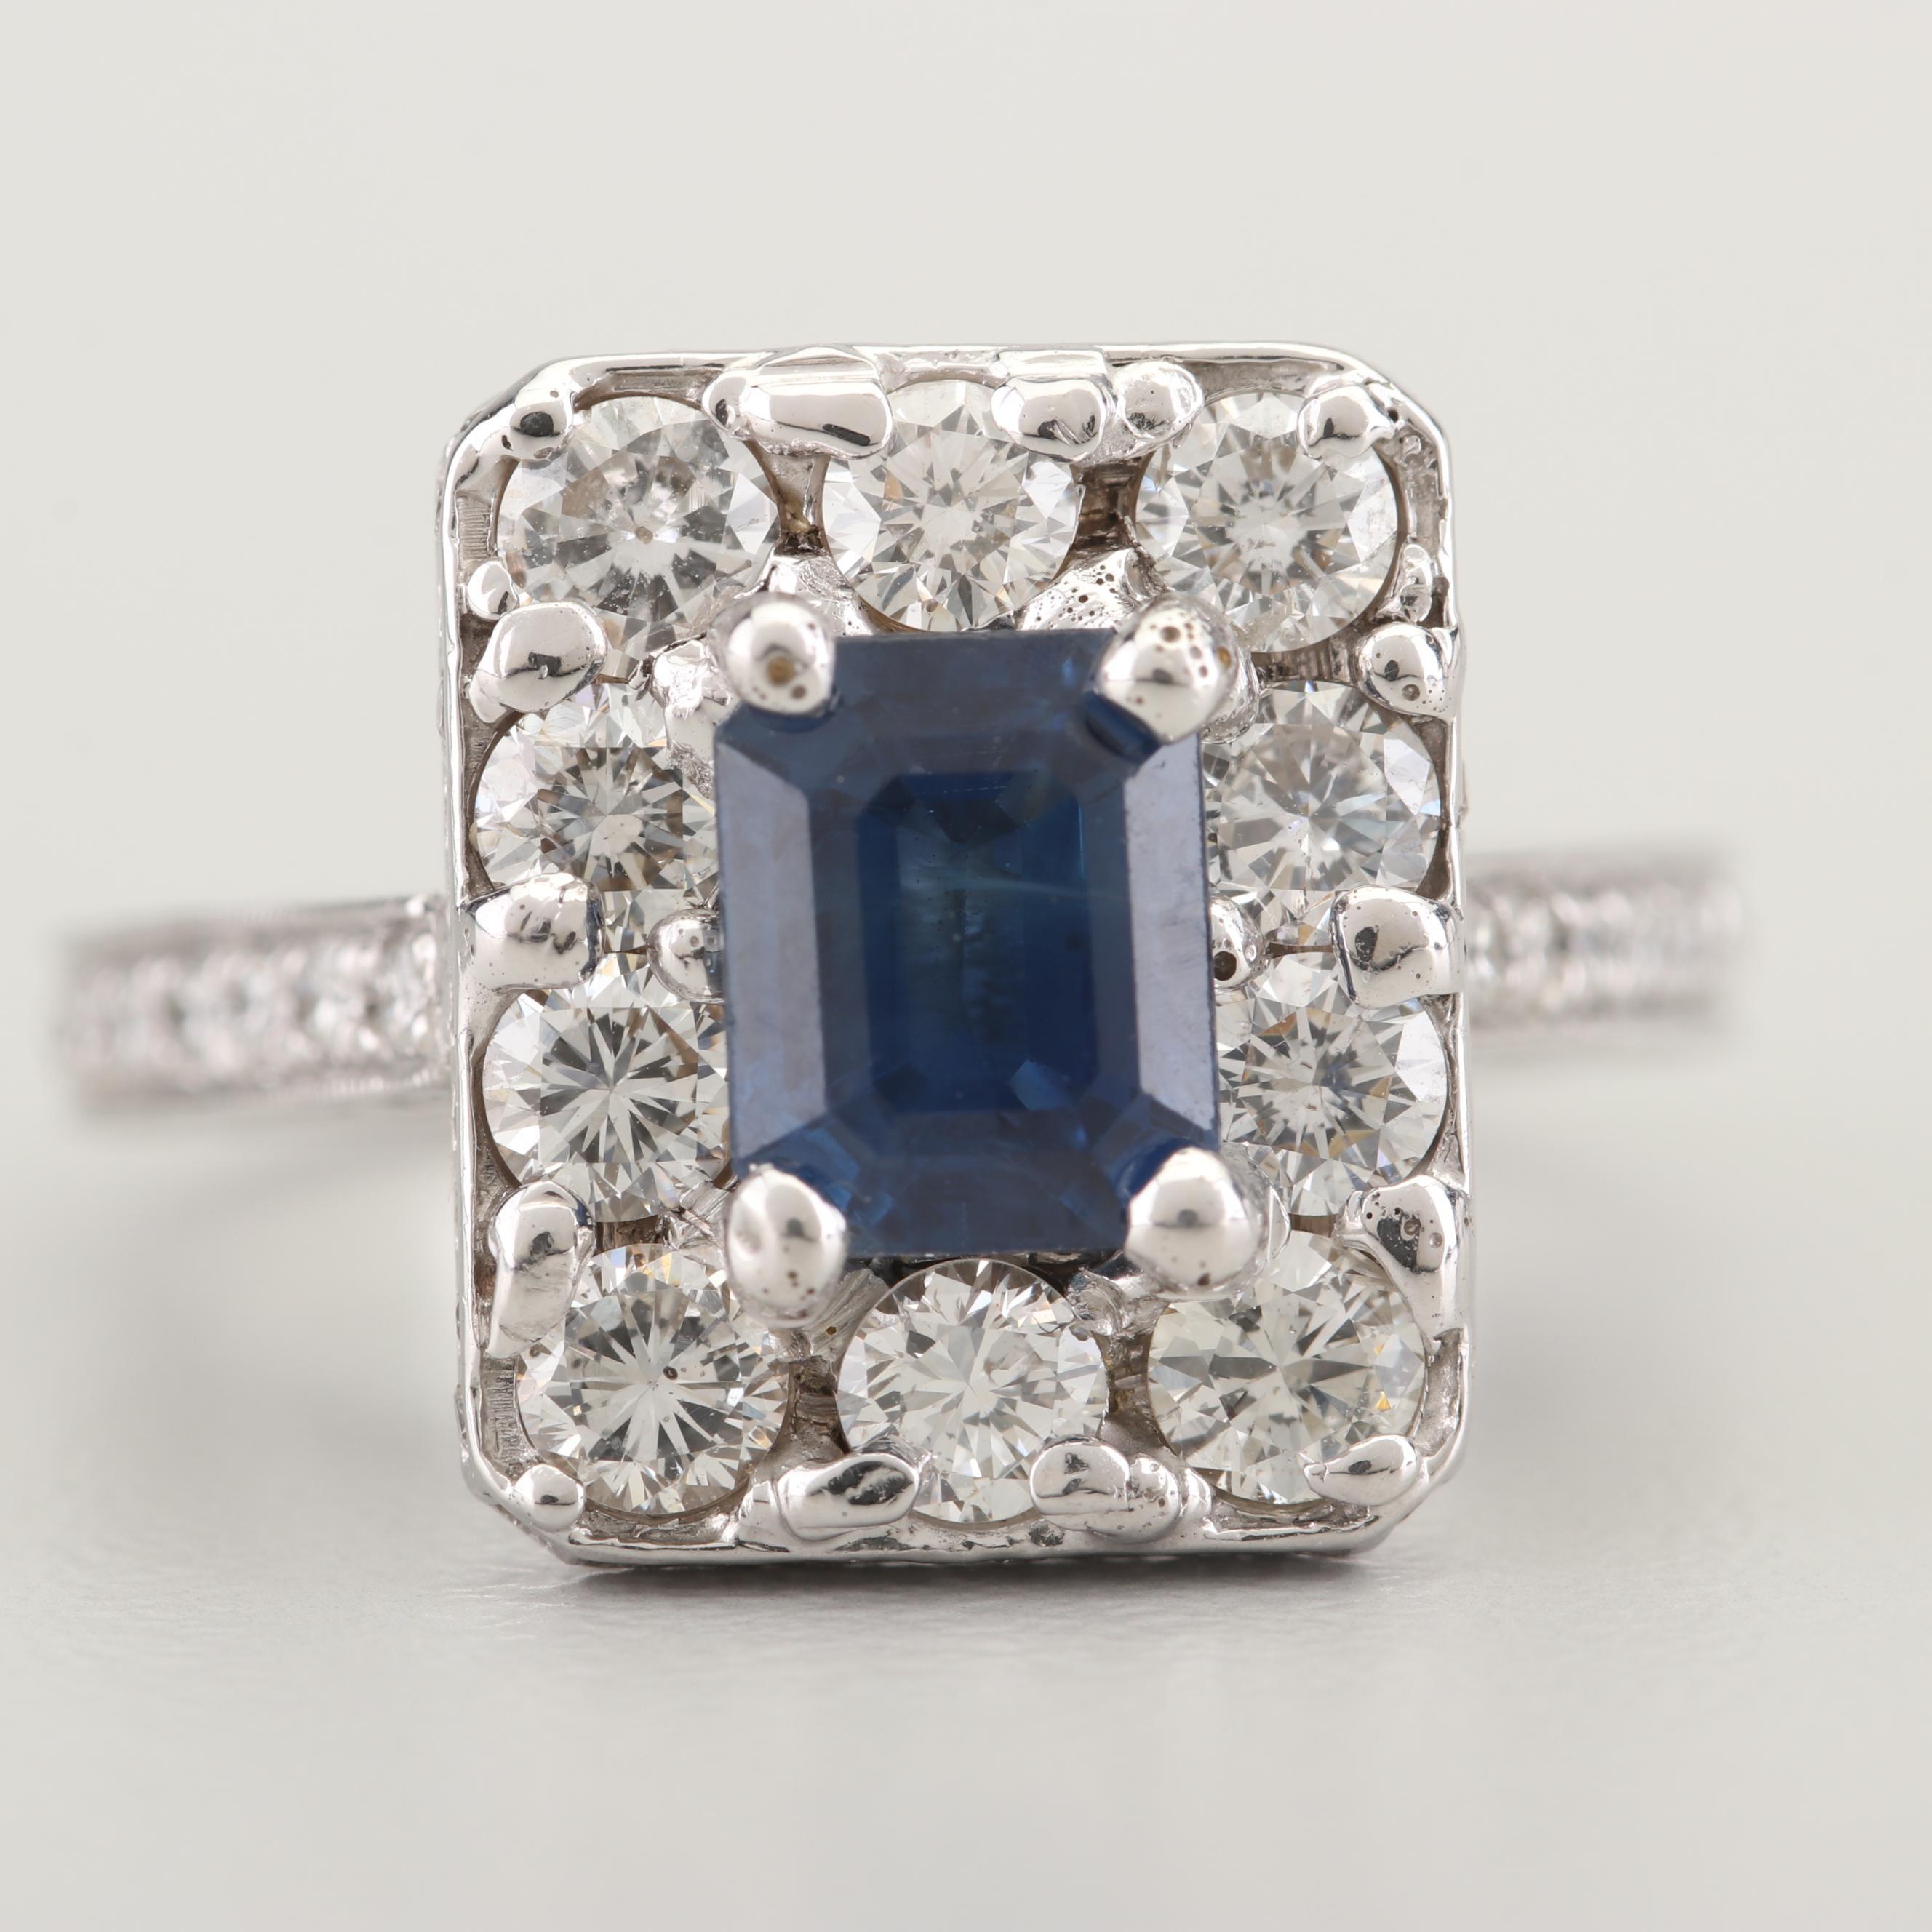 18K White Gold 1.60 CT Sapphire and 1.83 CTW Diamond Ring